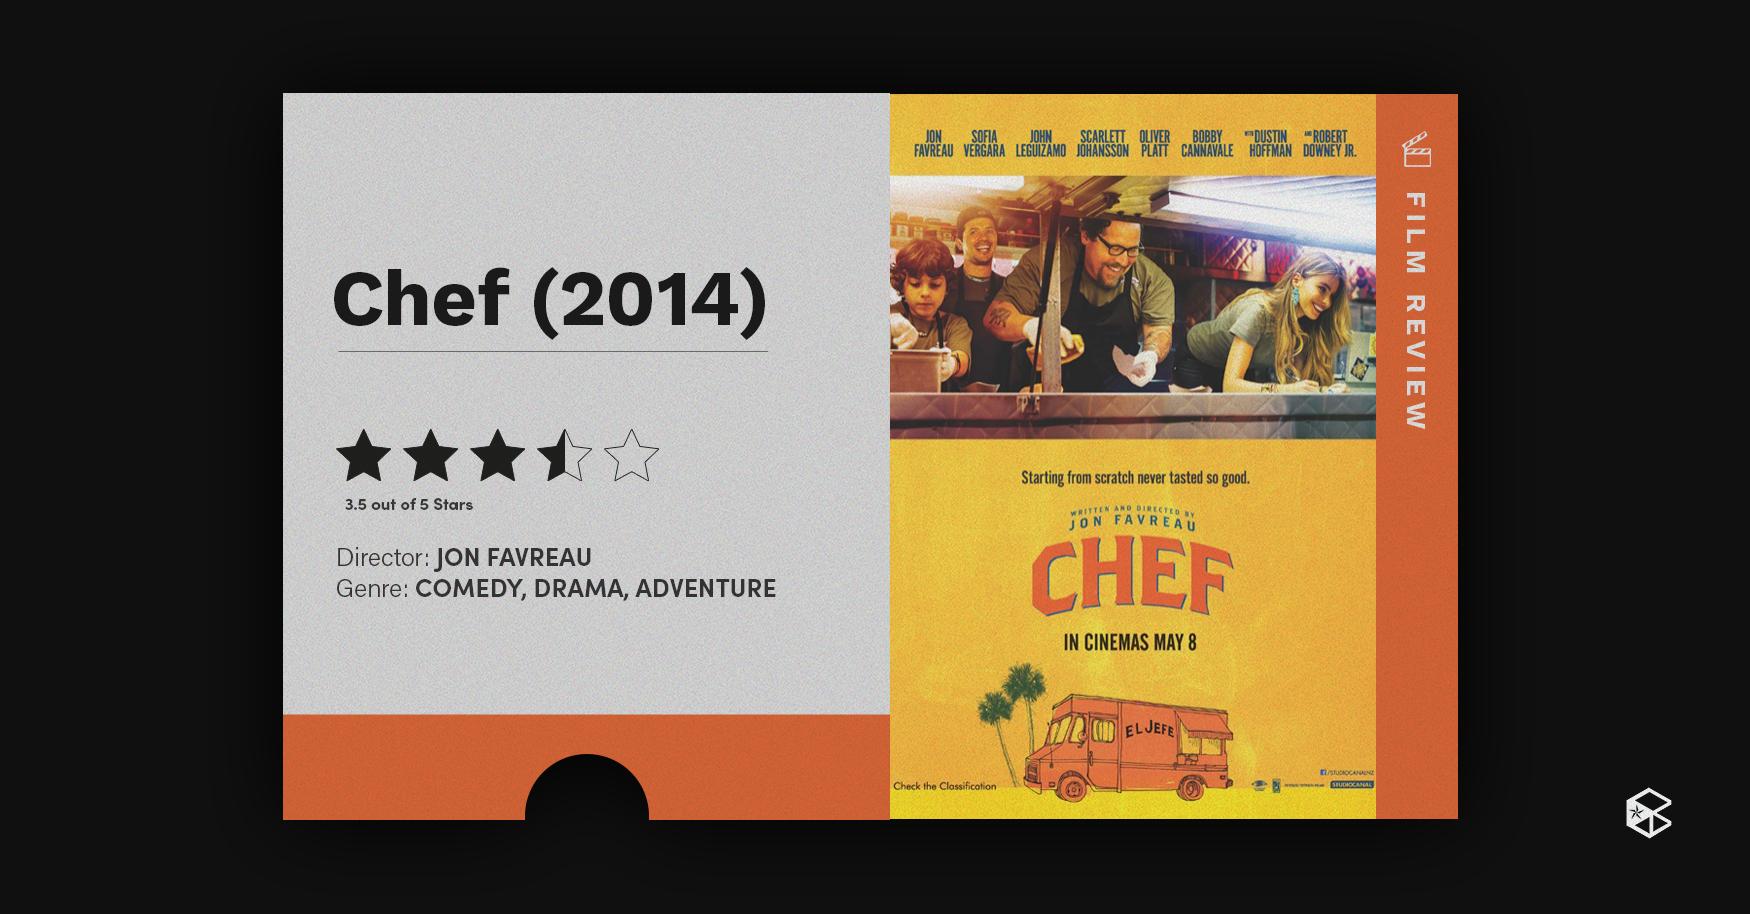 062021 [blip   Father's Day Movie Recs] Chef